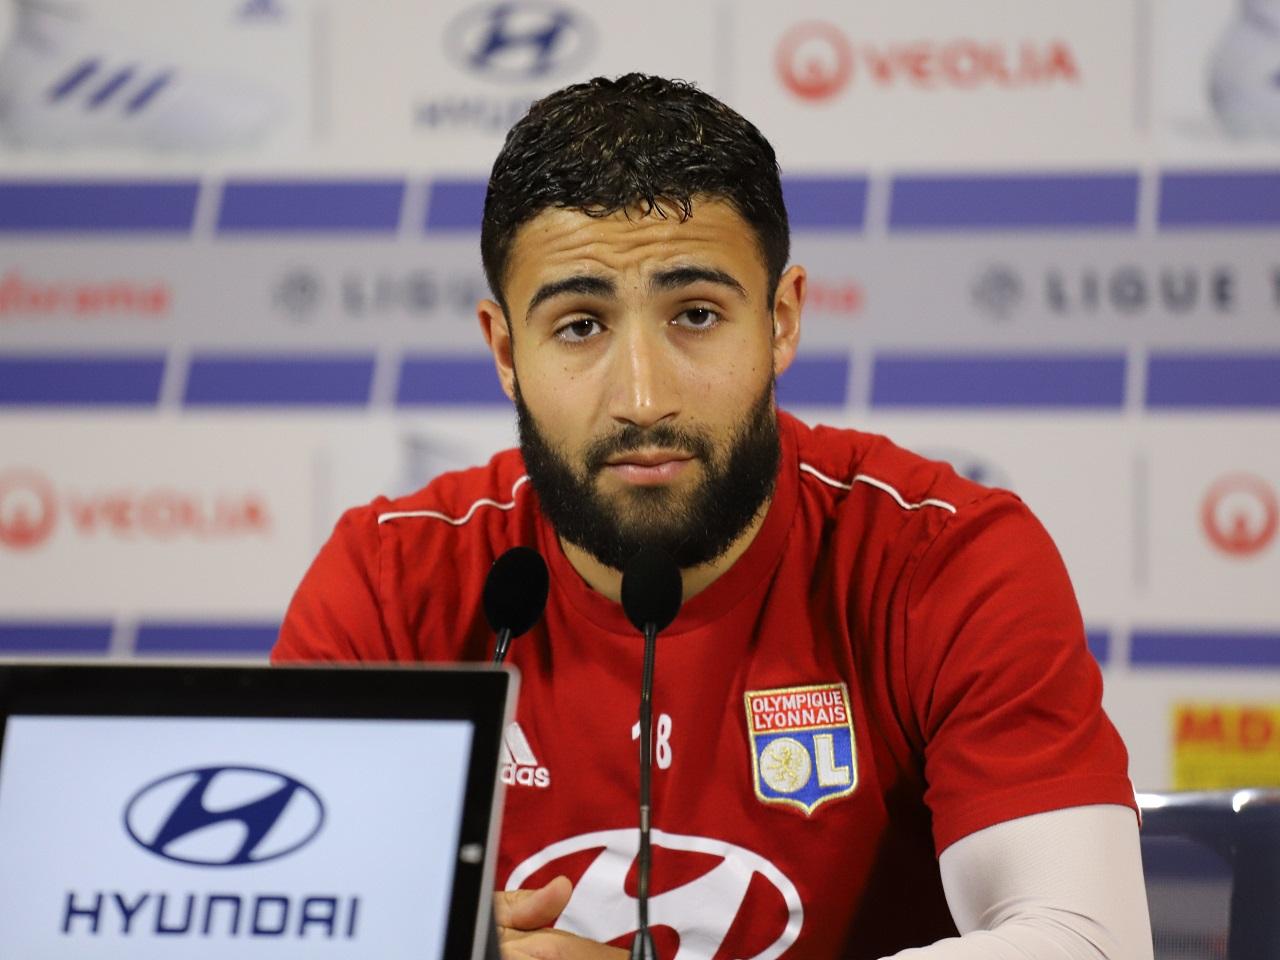 OL - Mercato : Sylvinho annonce le départ de Nabil Fékir